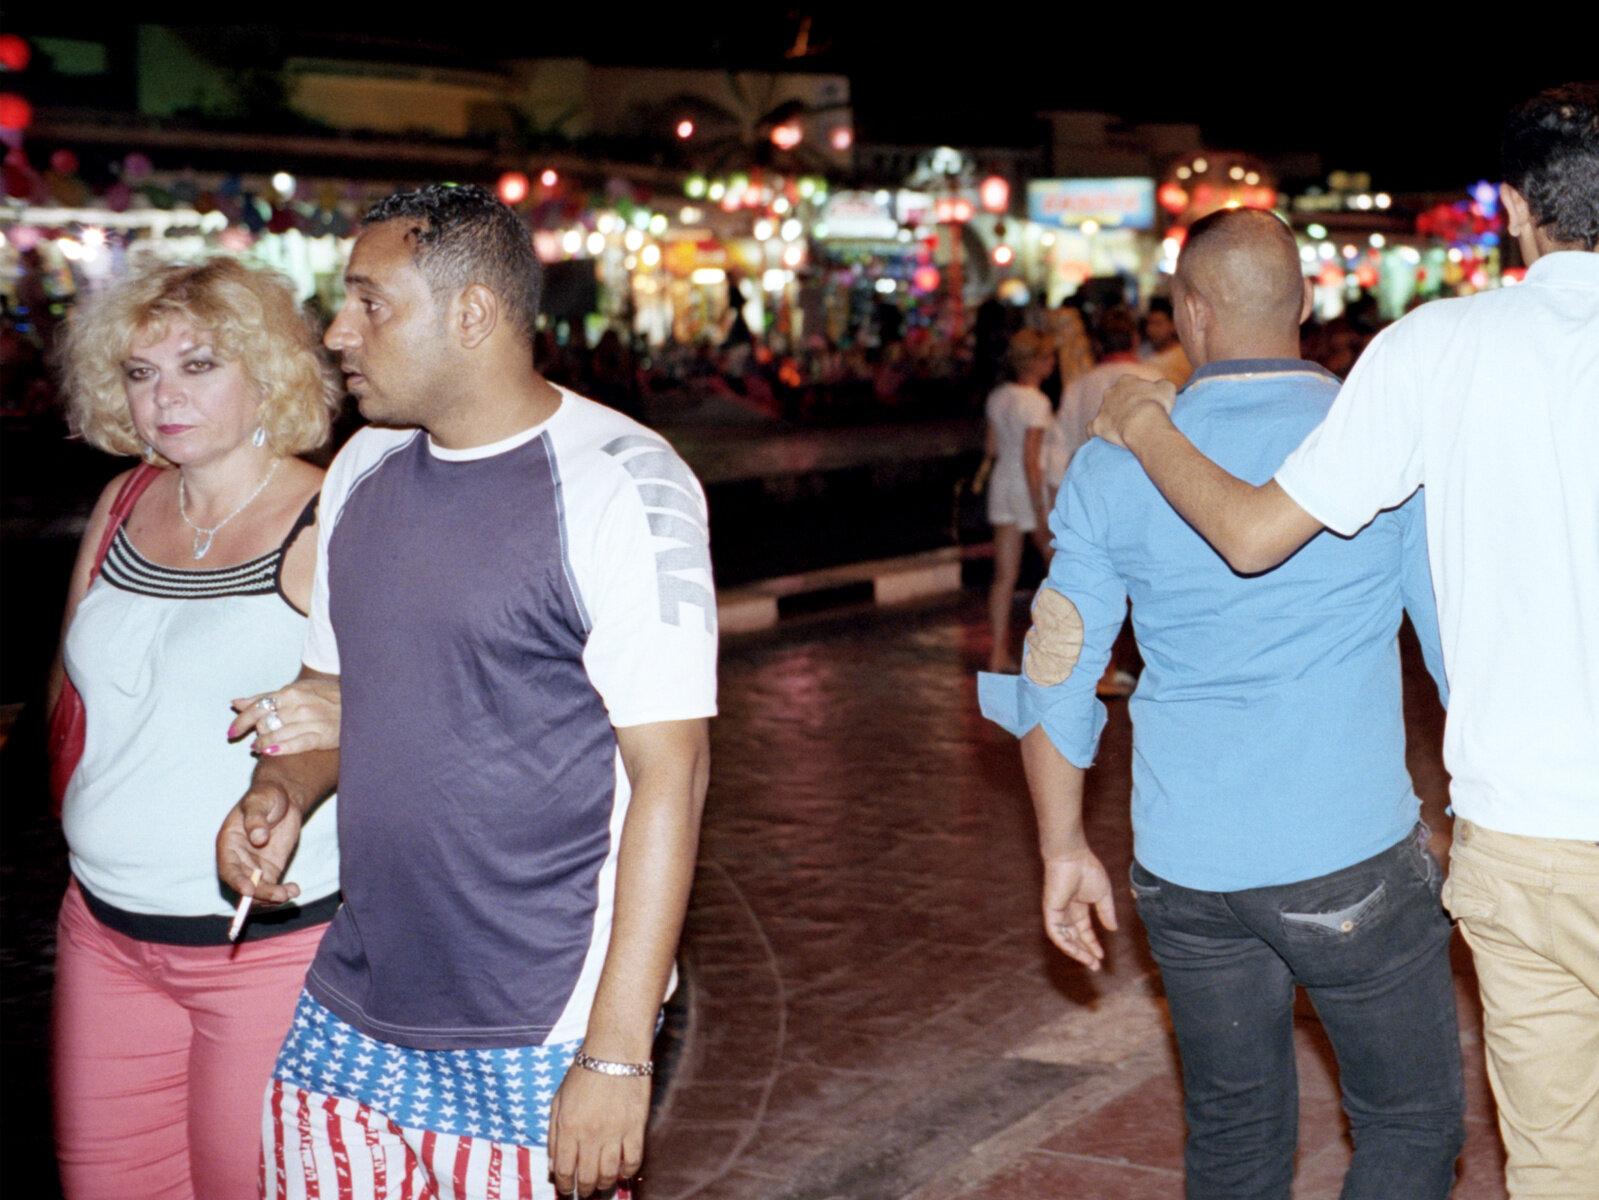 17_1_Sharm_at_night_1580_copy.jpg